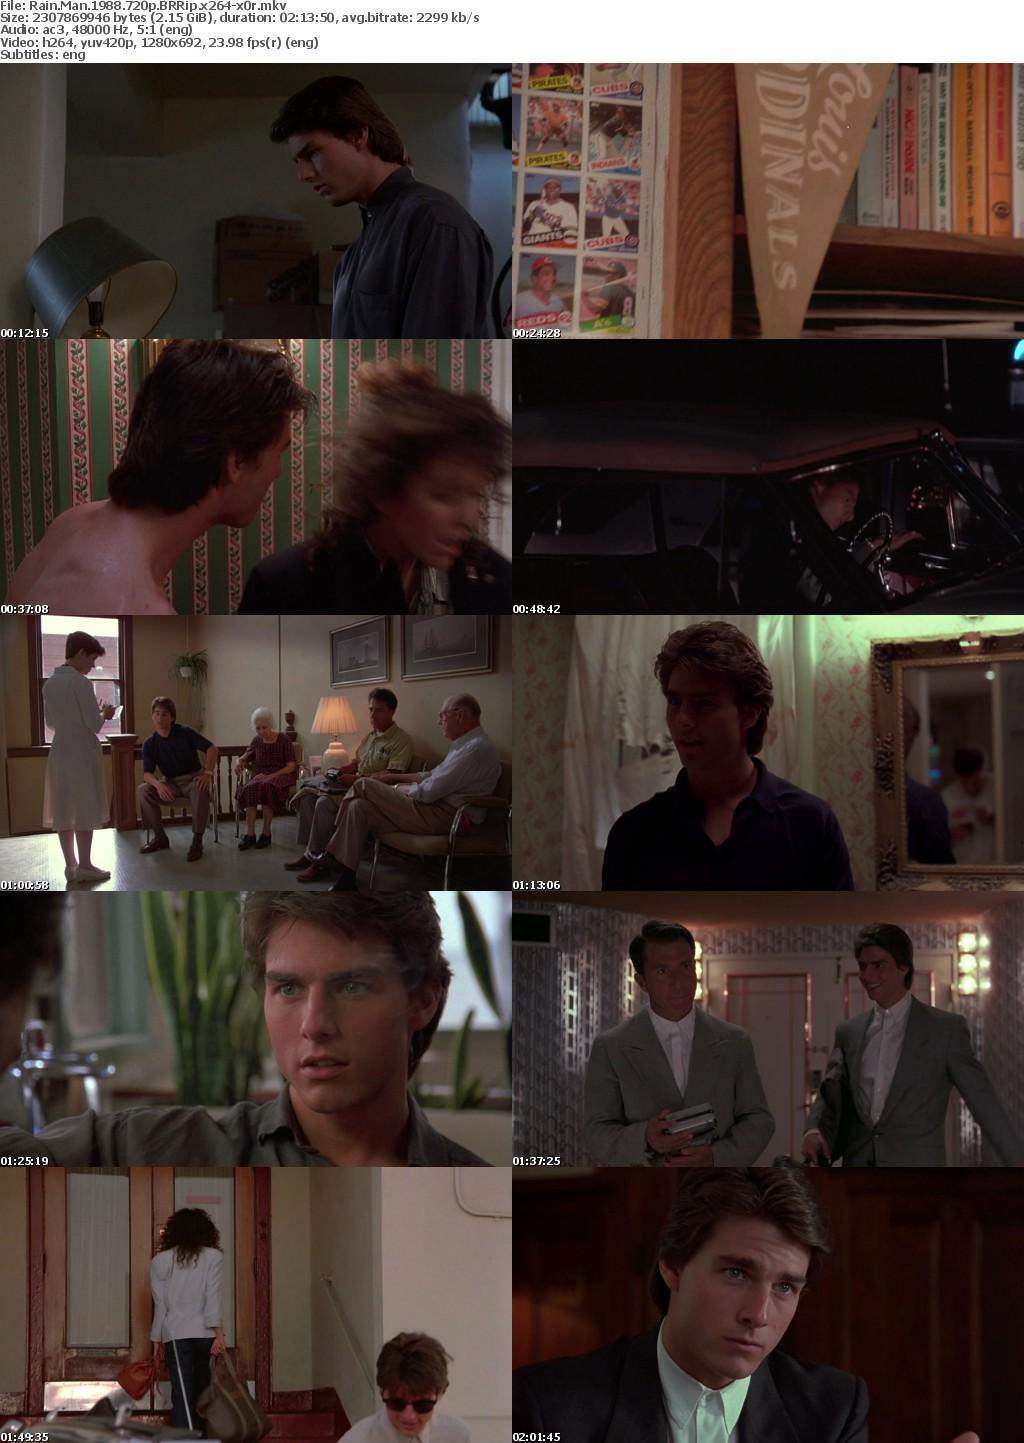 Rain Man 1988 720p BRRip x264-x0r